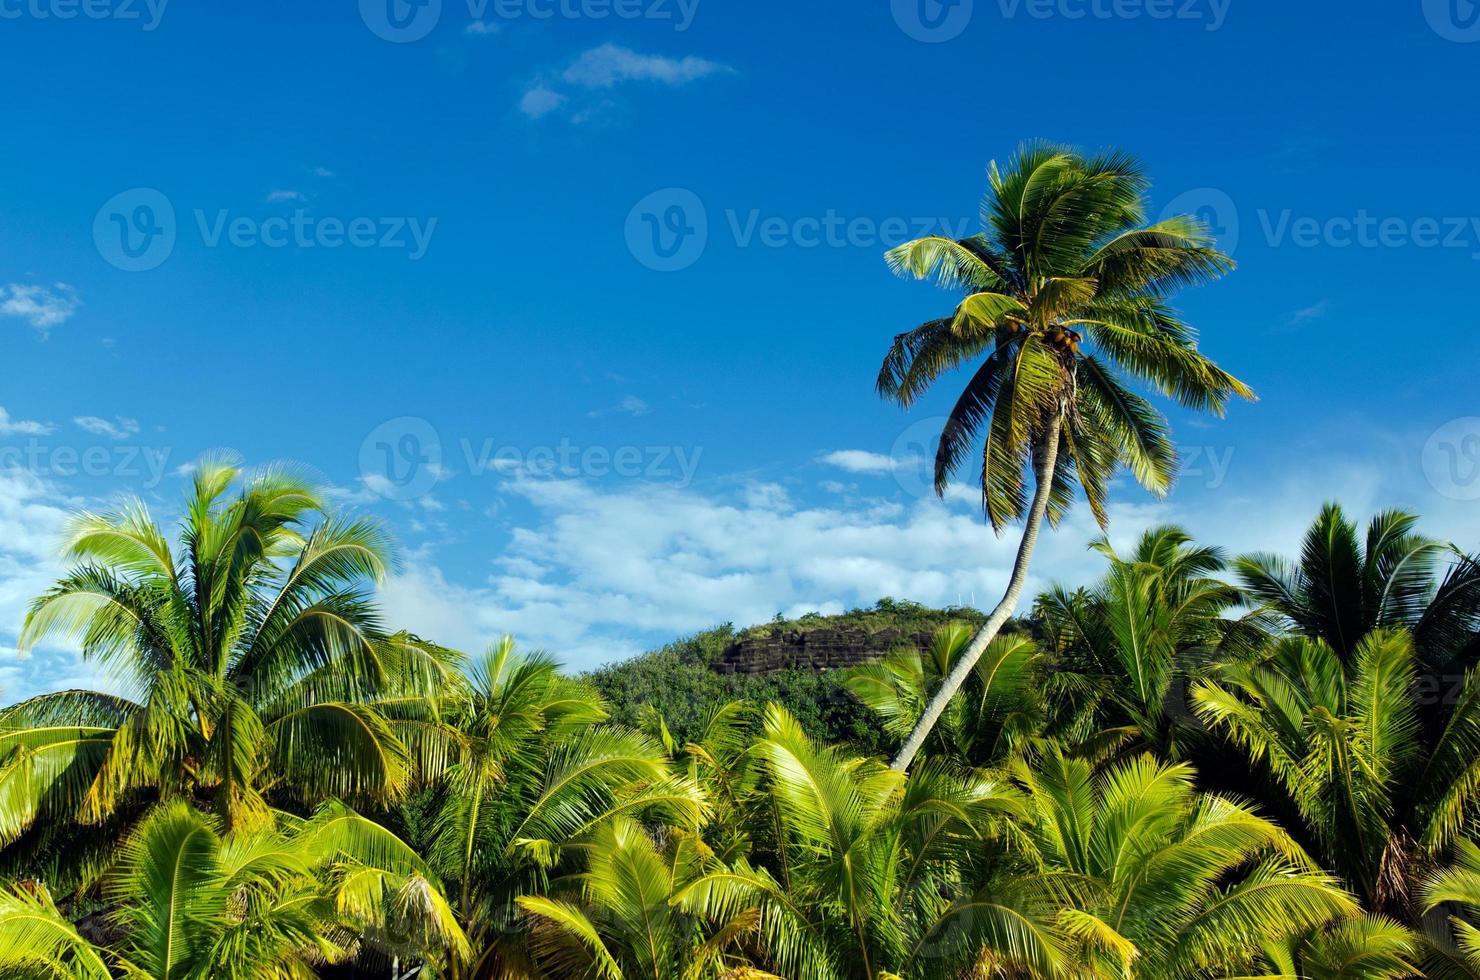 Coconut Trees in Aitutaki Lagoon Cook Islands photo